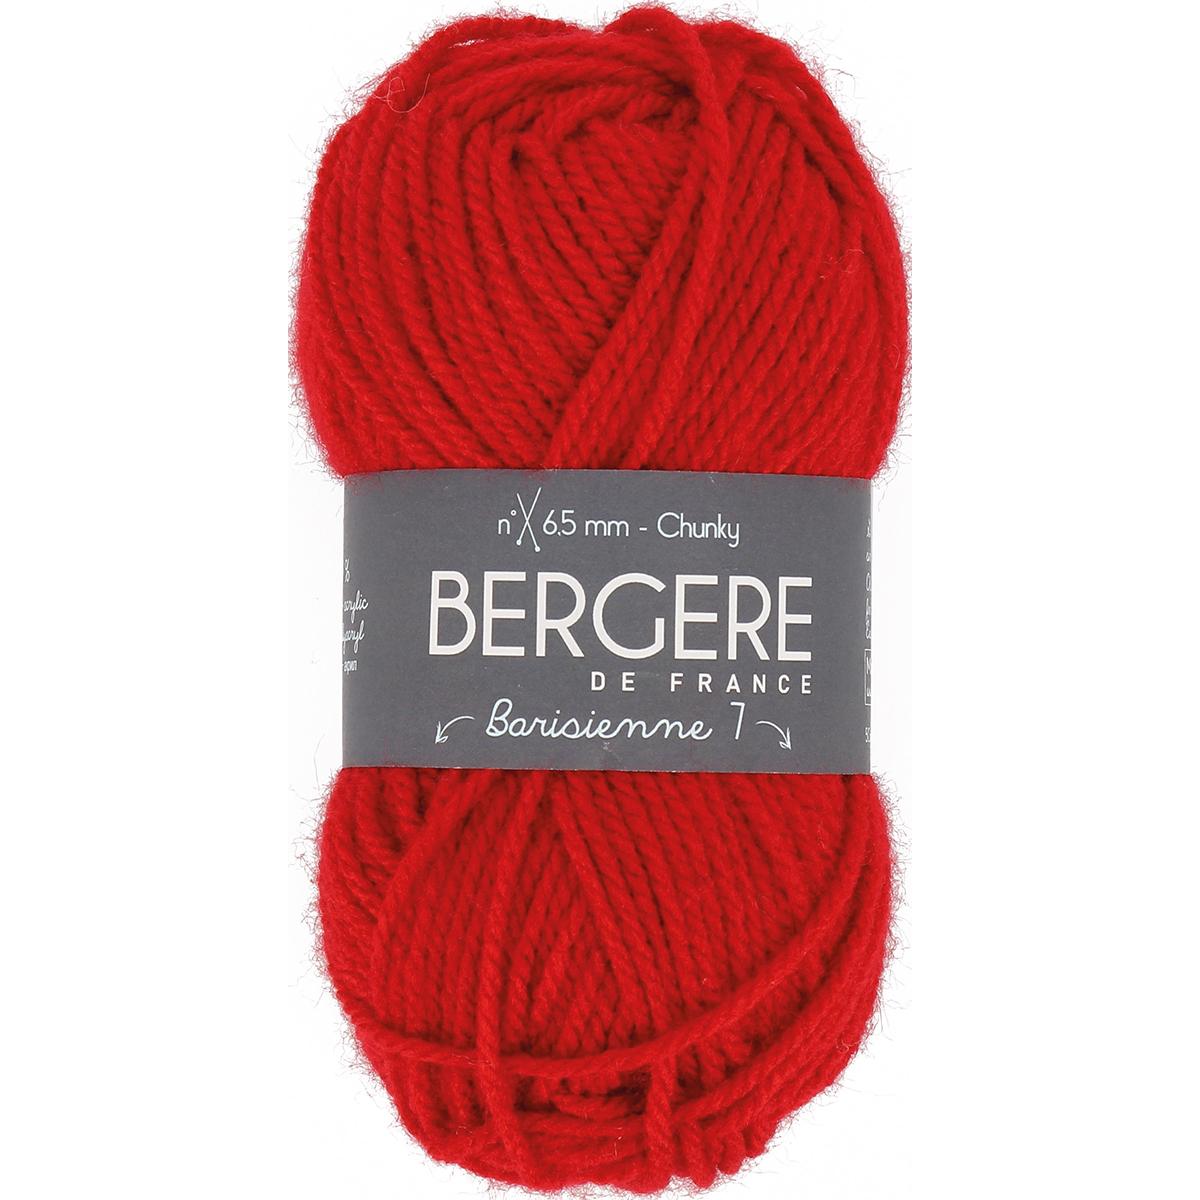 Bergere De France BARISIE7-10217 Diabolo - Barisienne 7 Yarn